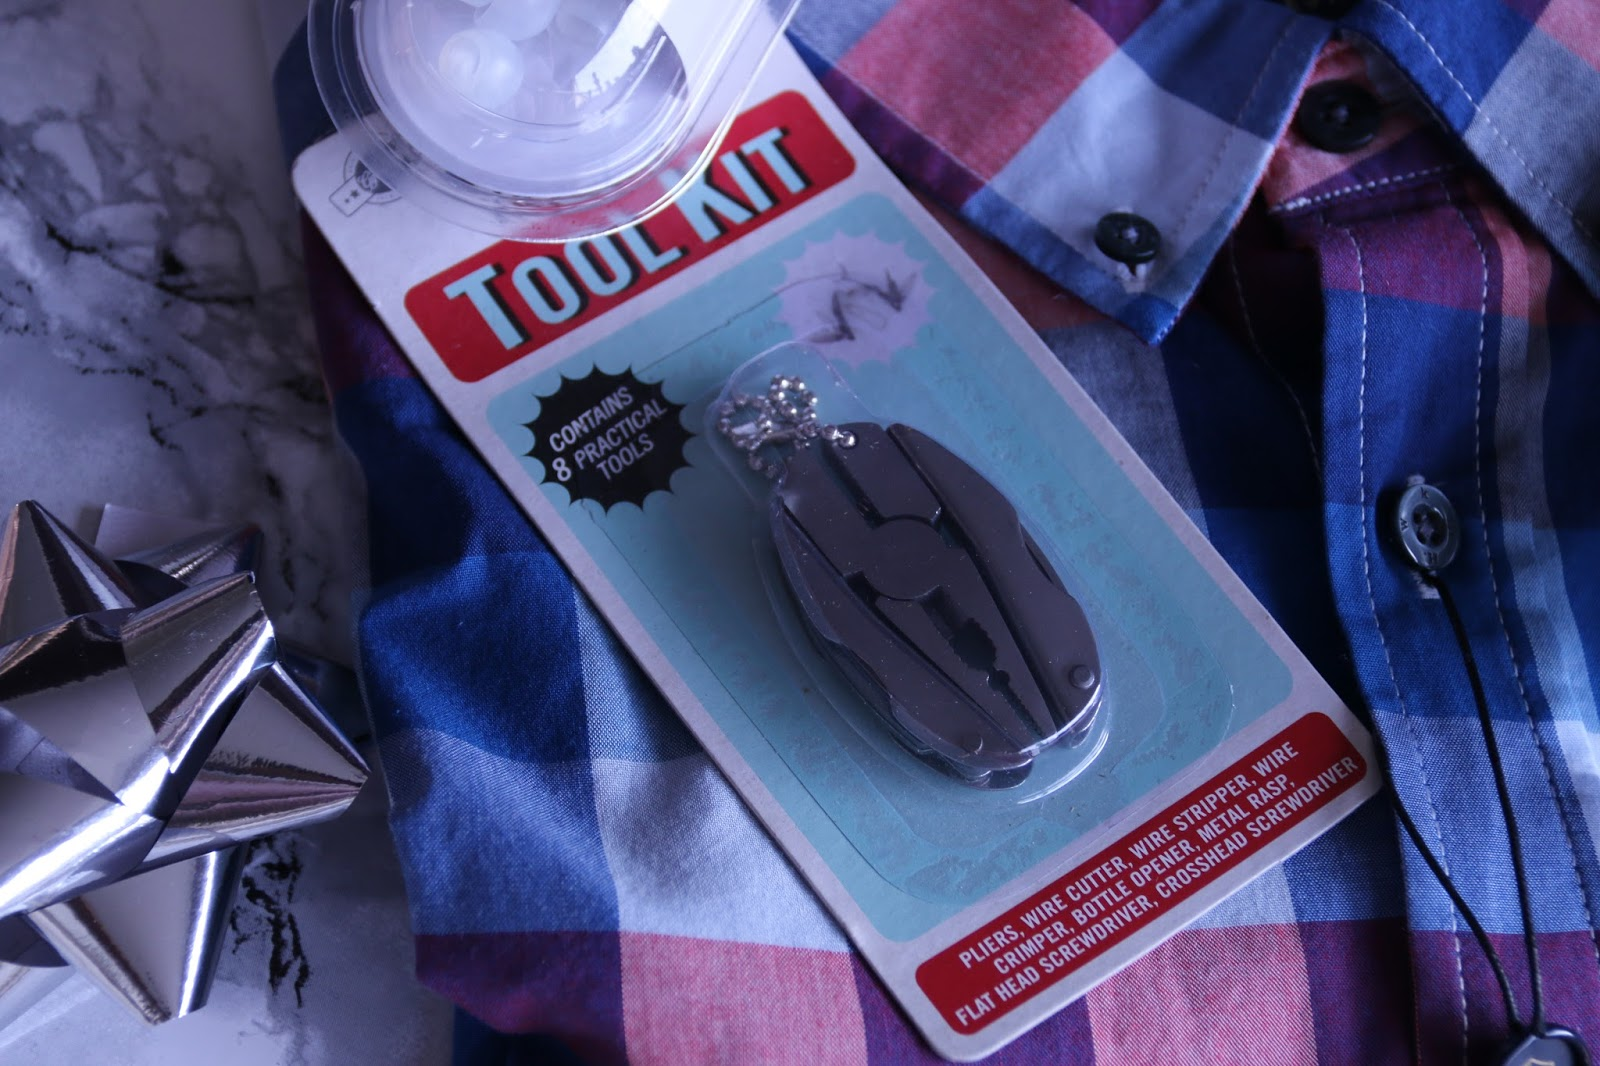 Superdrug Gift Stuff Keychain Tool Kit Image